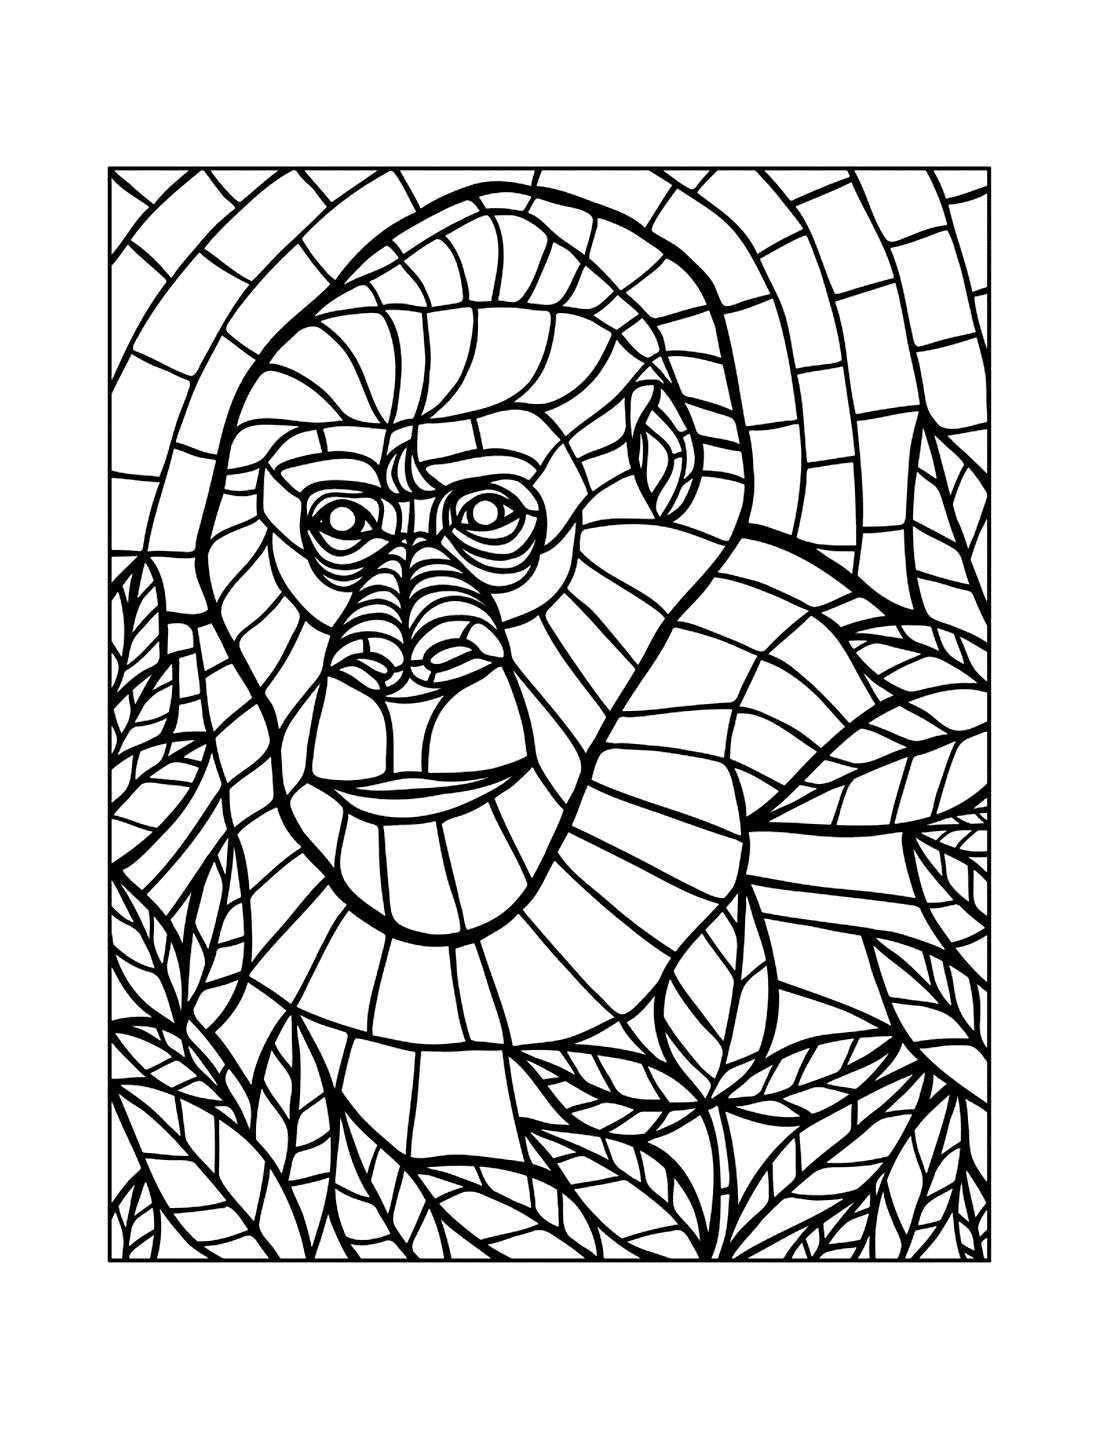 Mosaic Gorilla Coloring Page